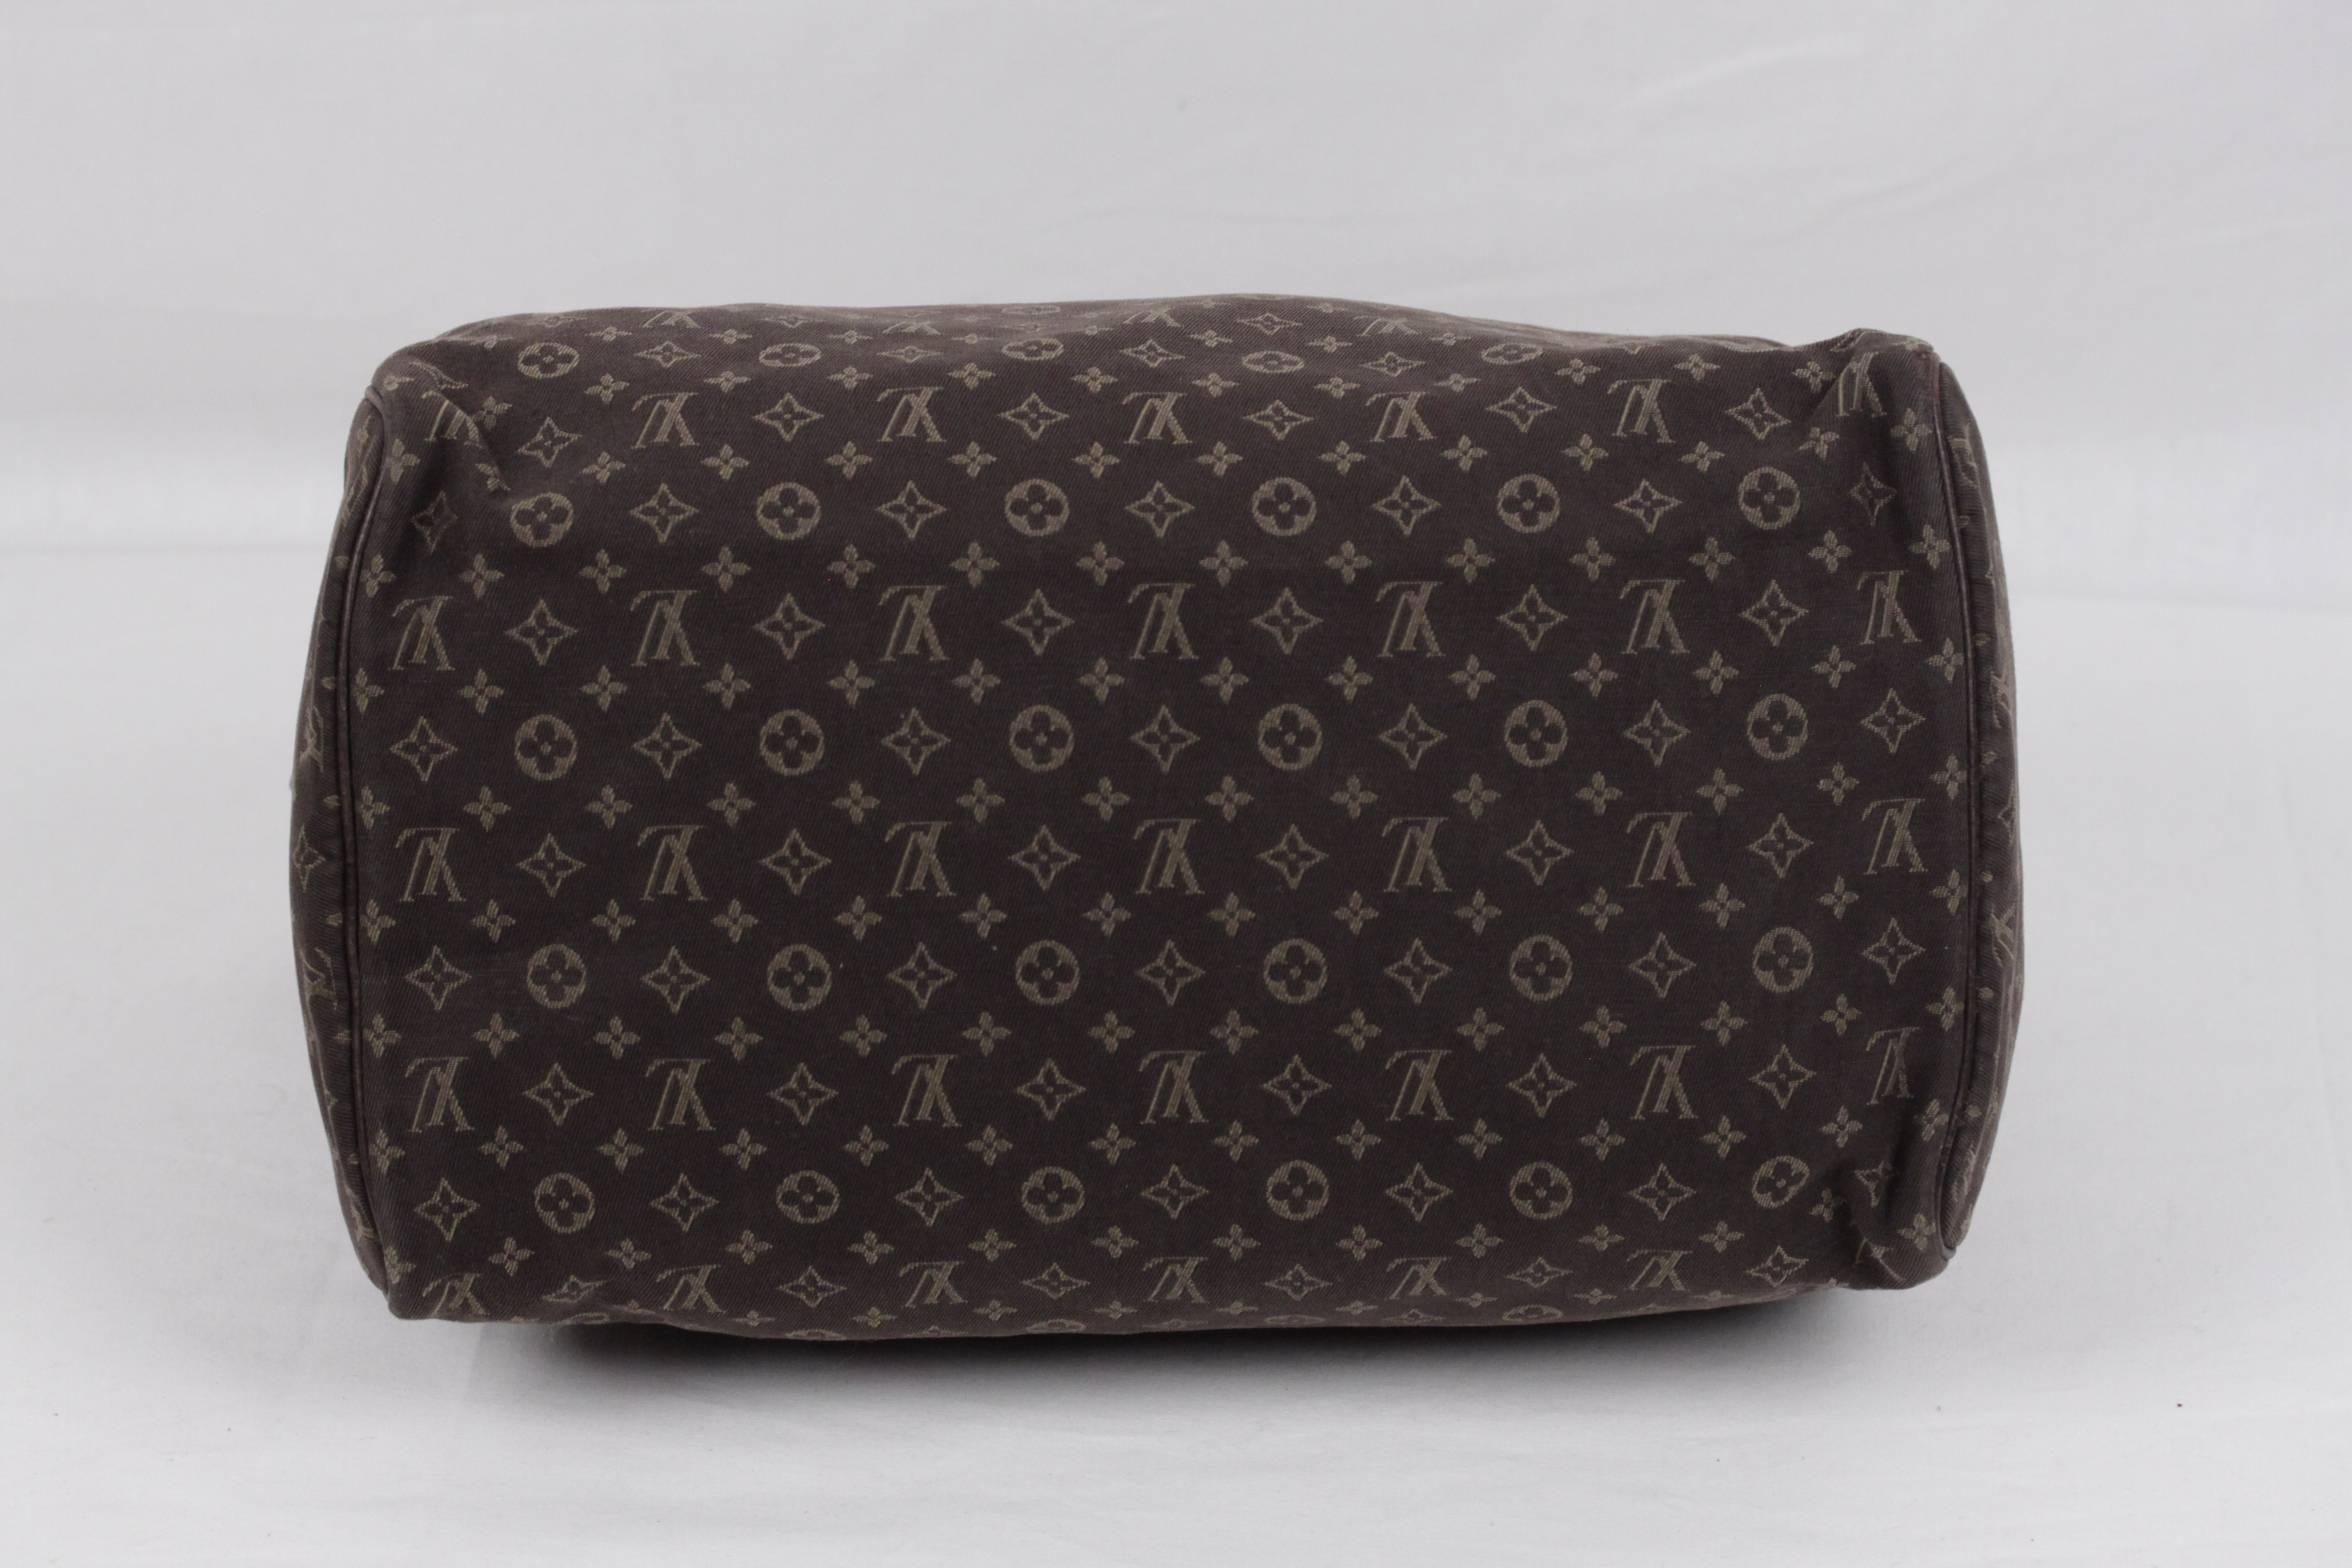 Louis Vuitton Brown Idylle Monogram Mini Lin Canvas Speedy 30 Bag Maroon Handbag At 1stdibs